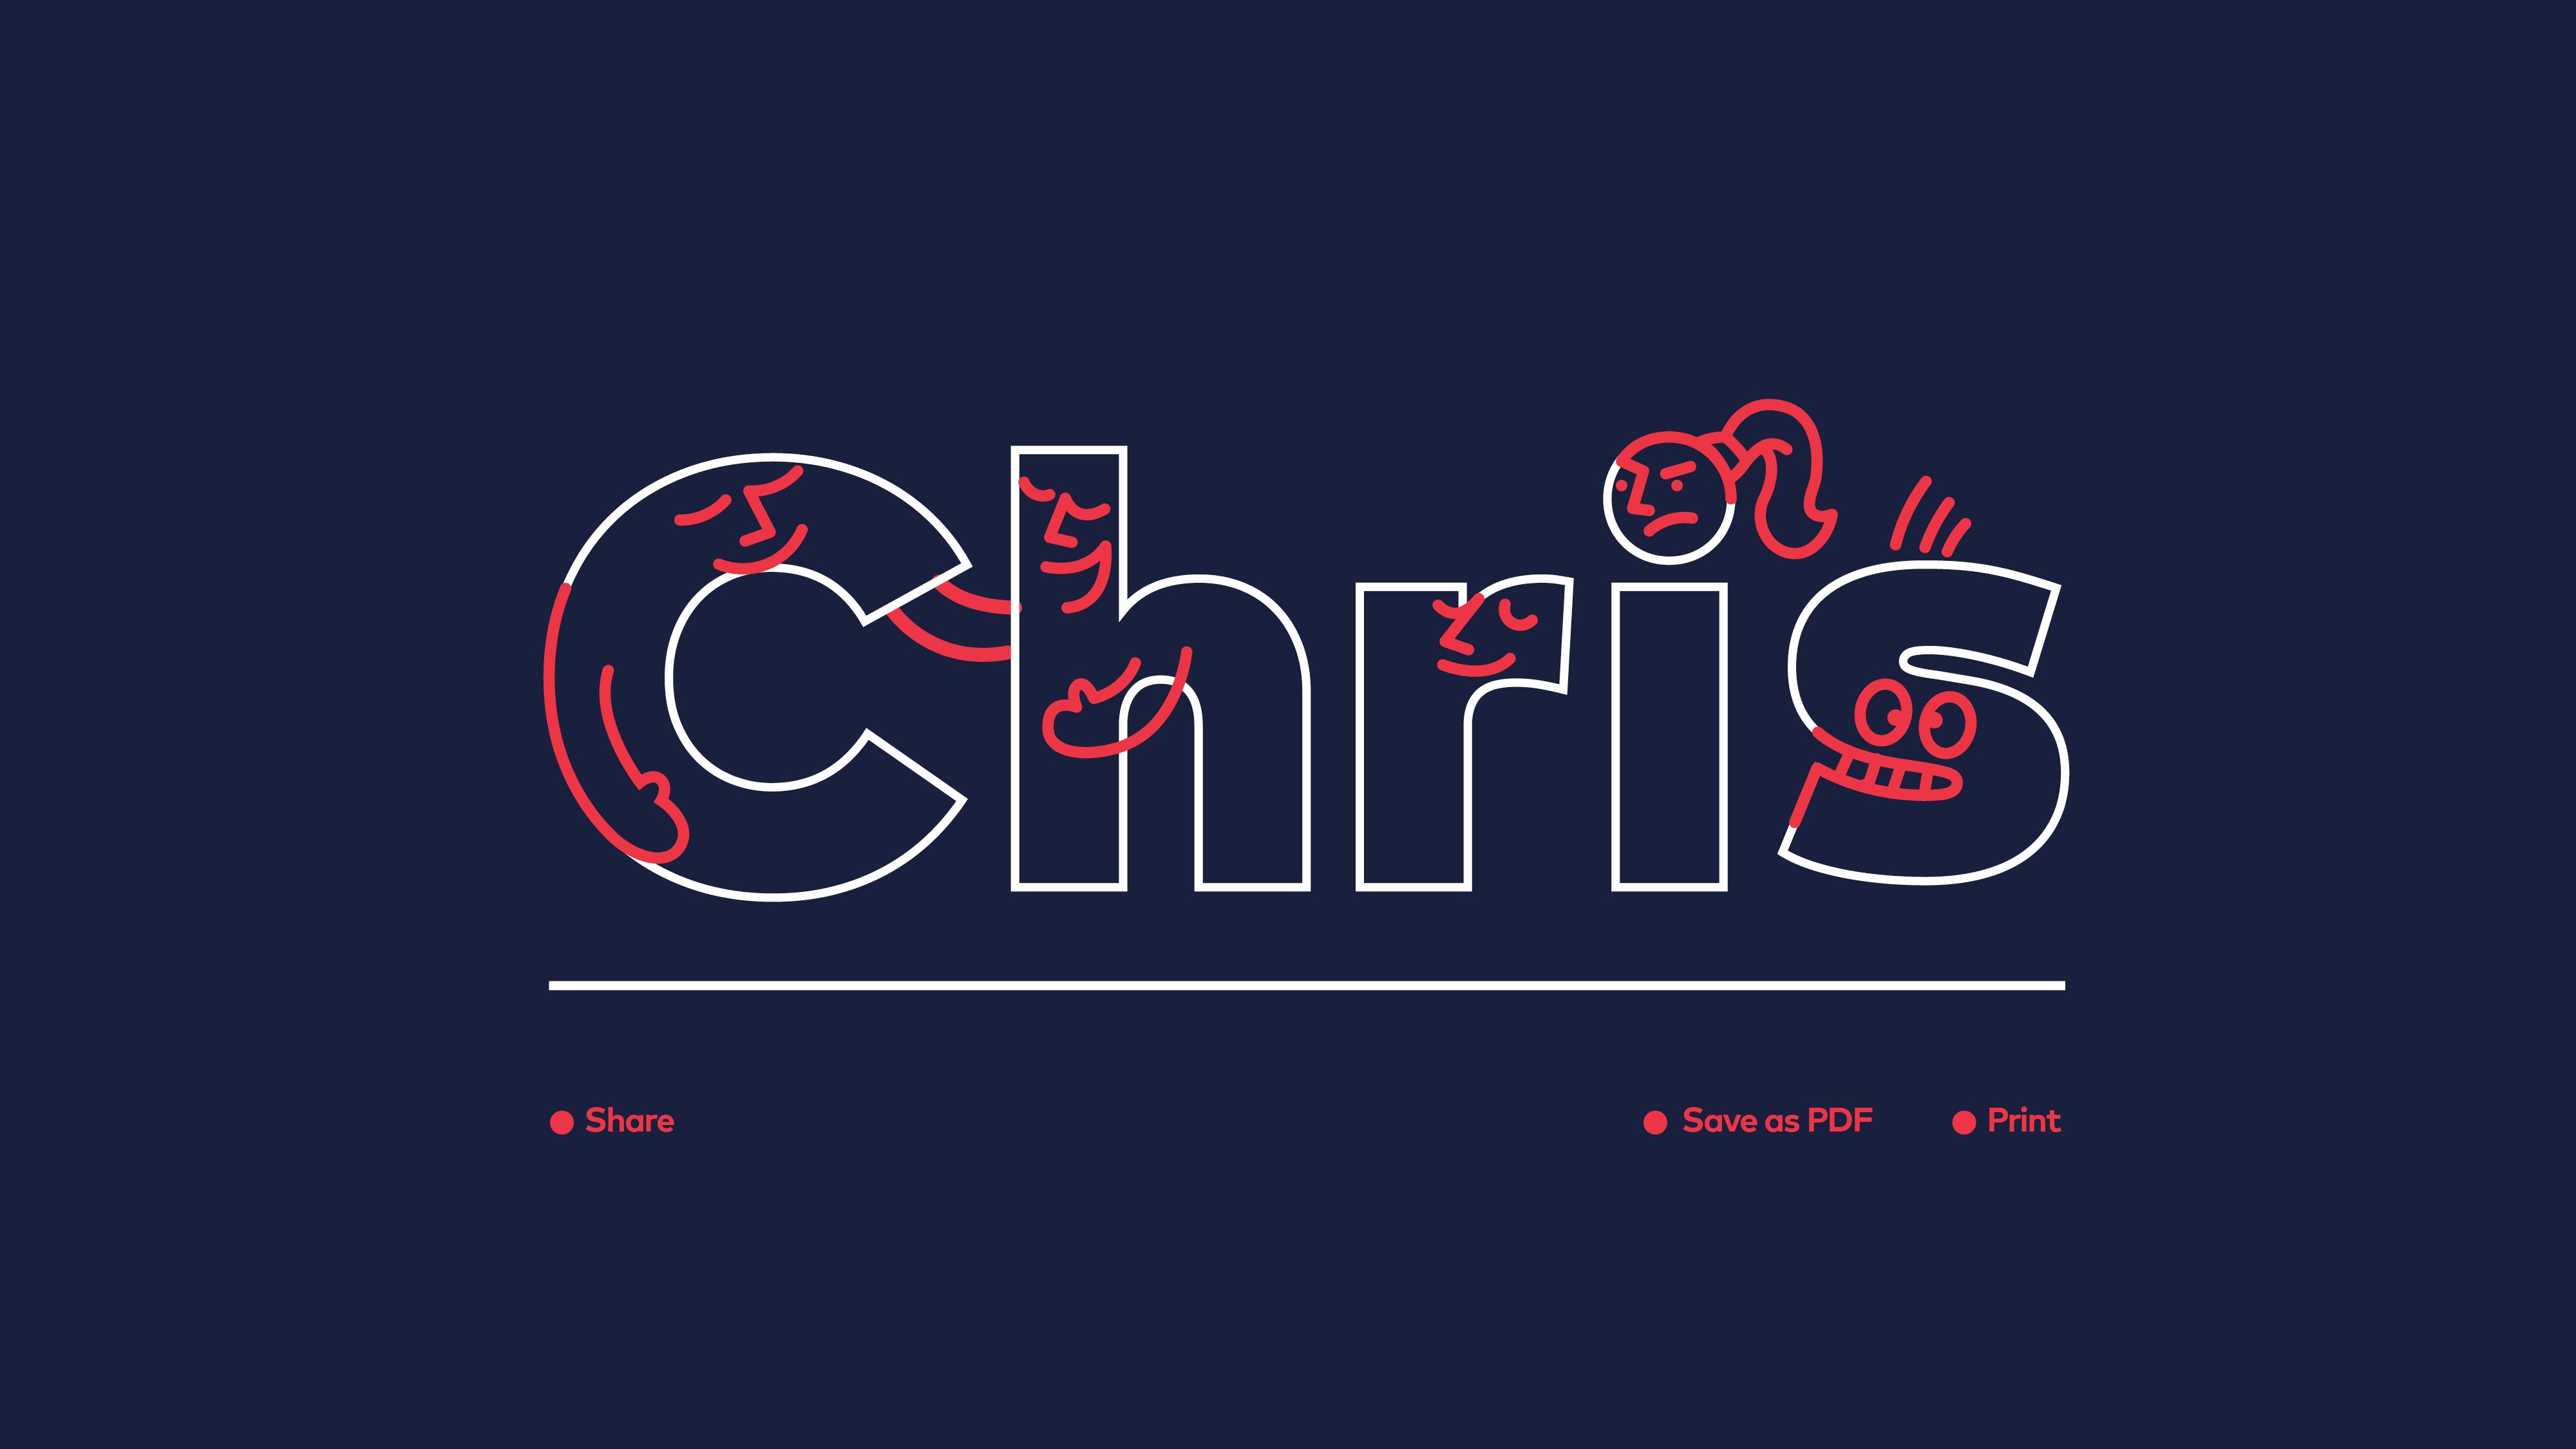 Chris_Pitney_2019_illustration